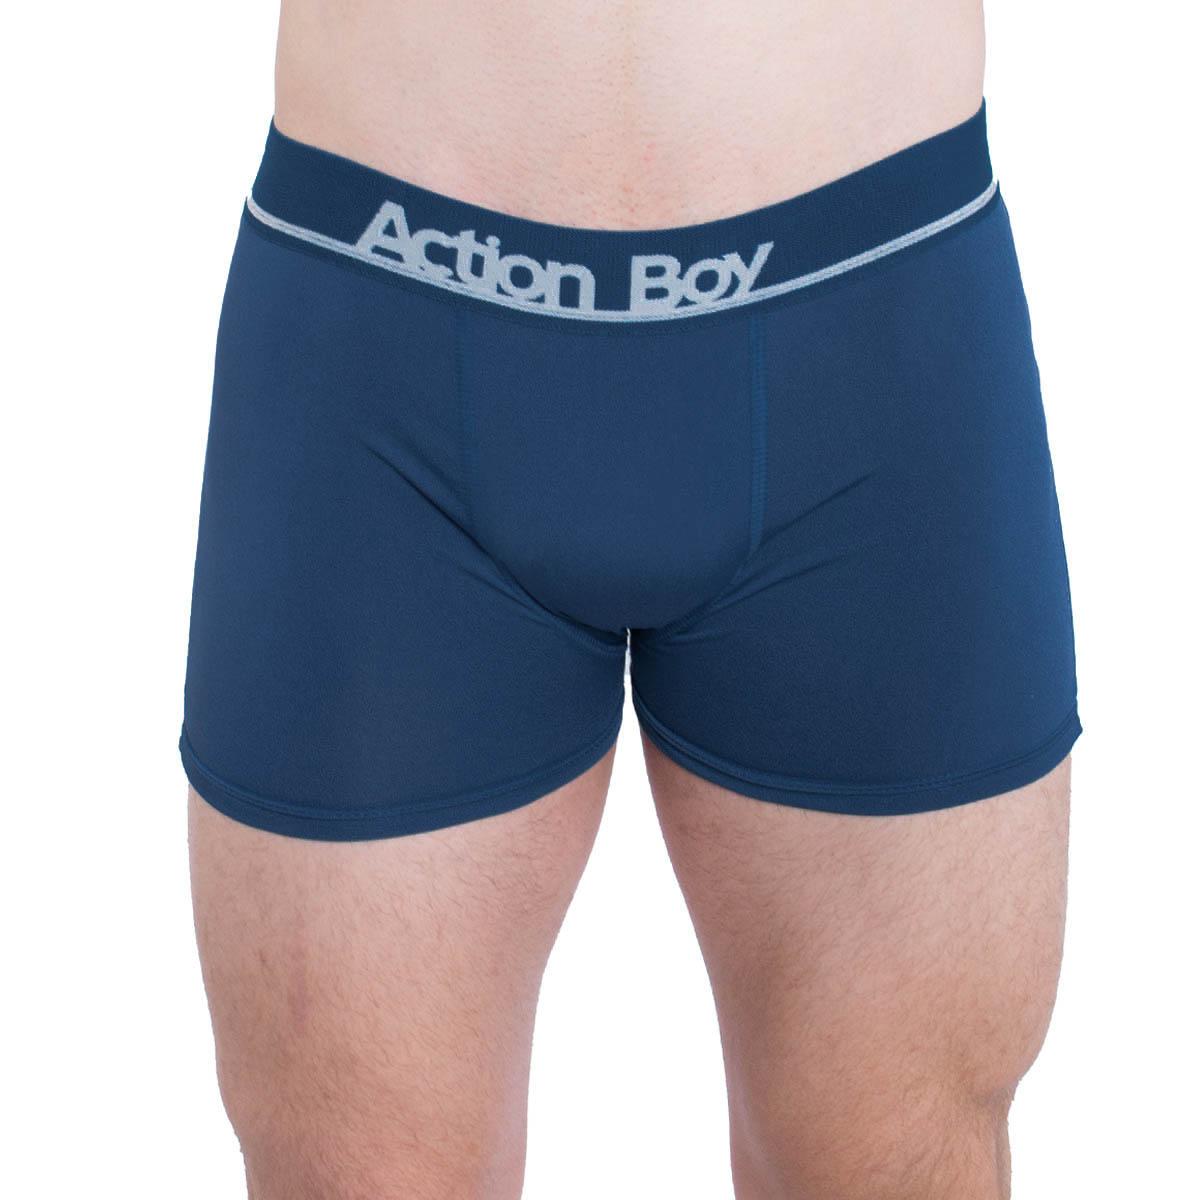 Cueca modelo boxer em microfibra Action Boy